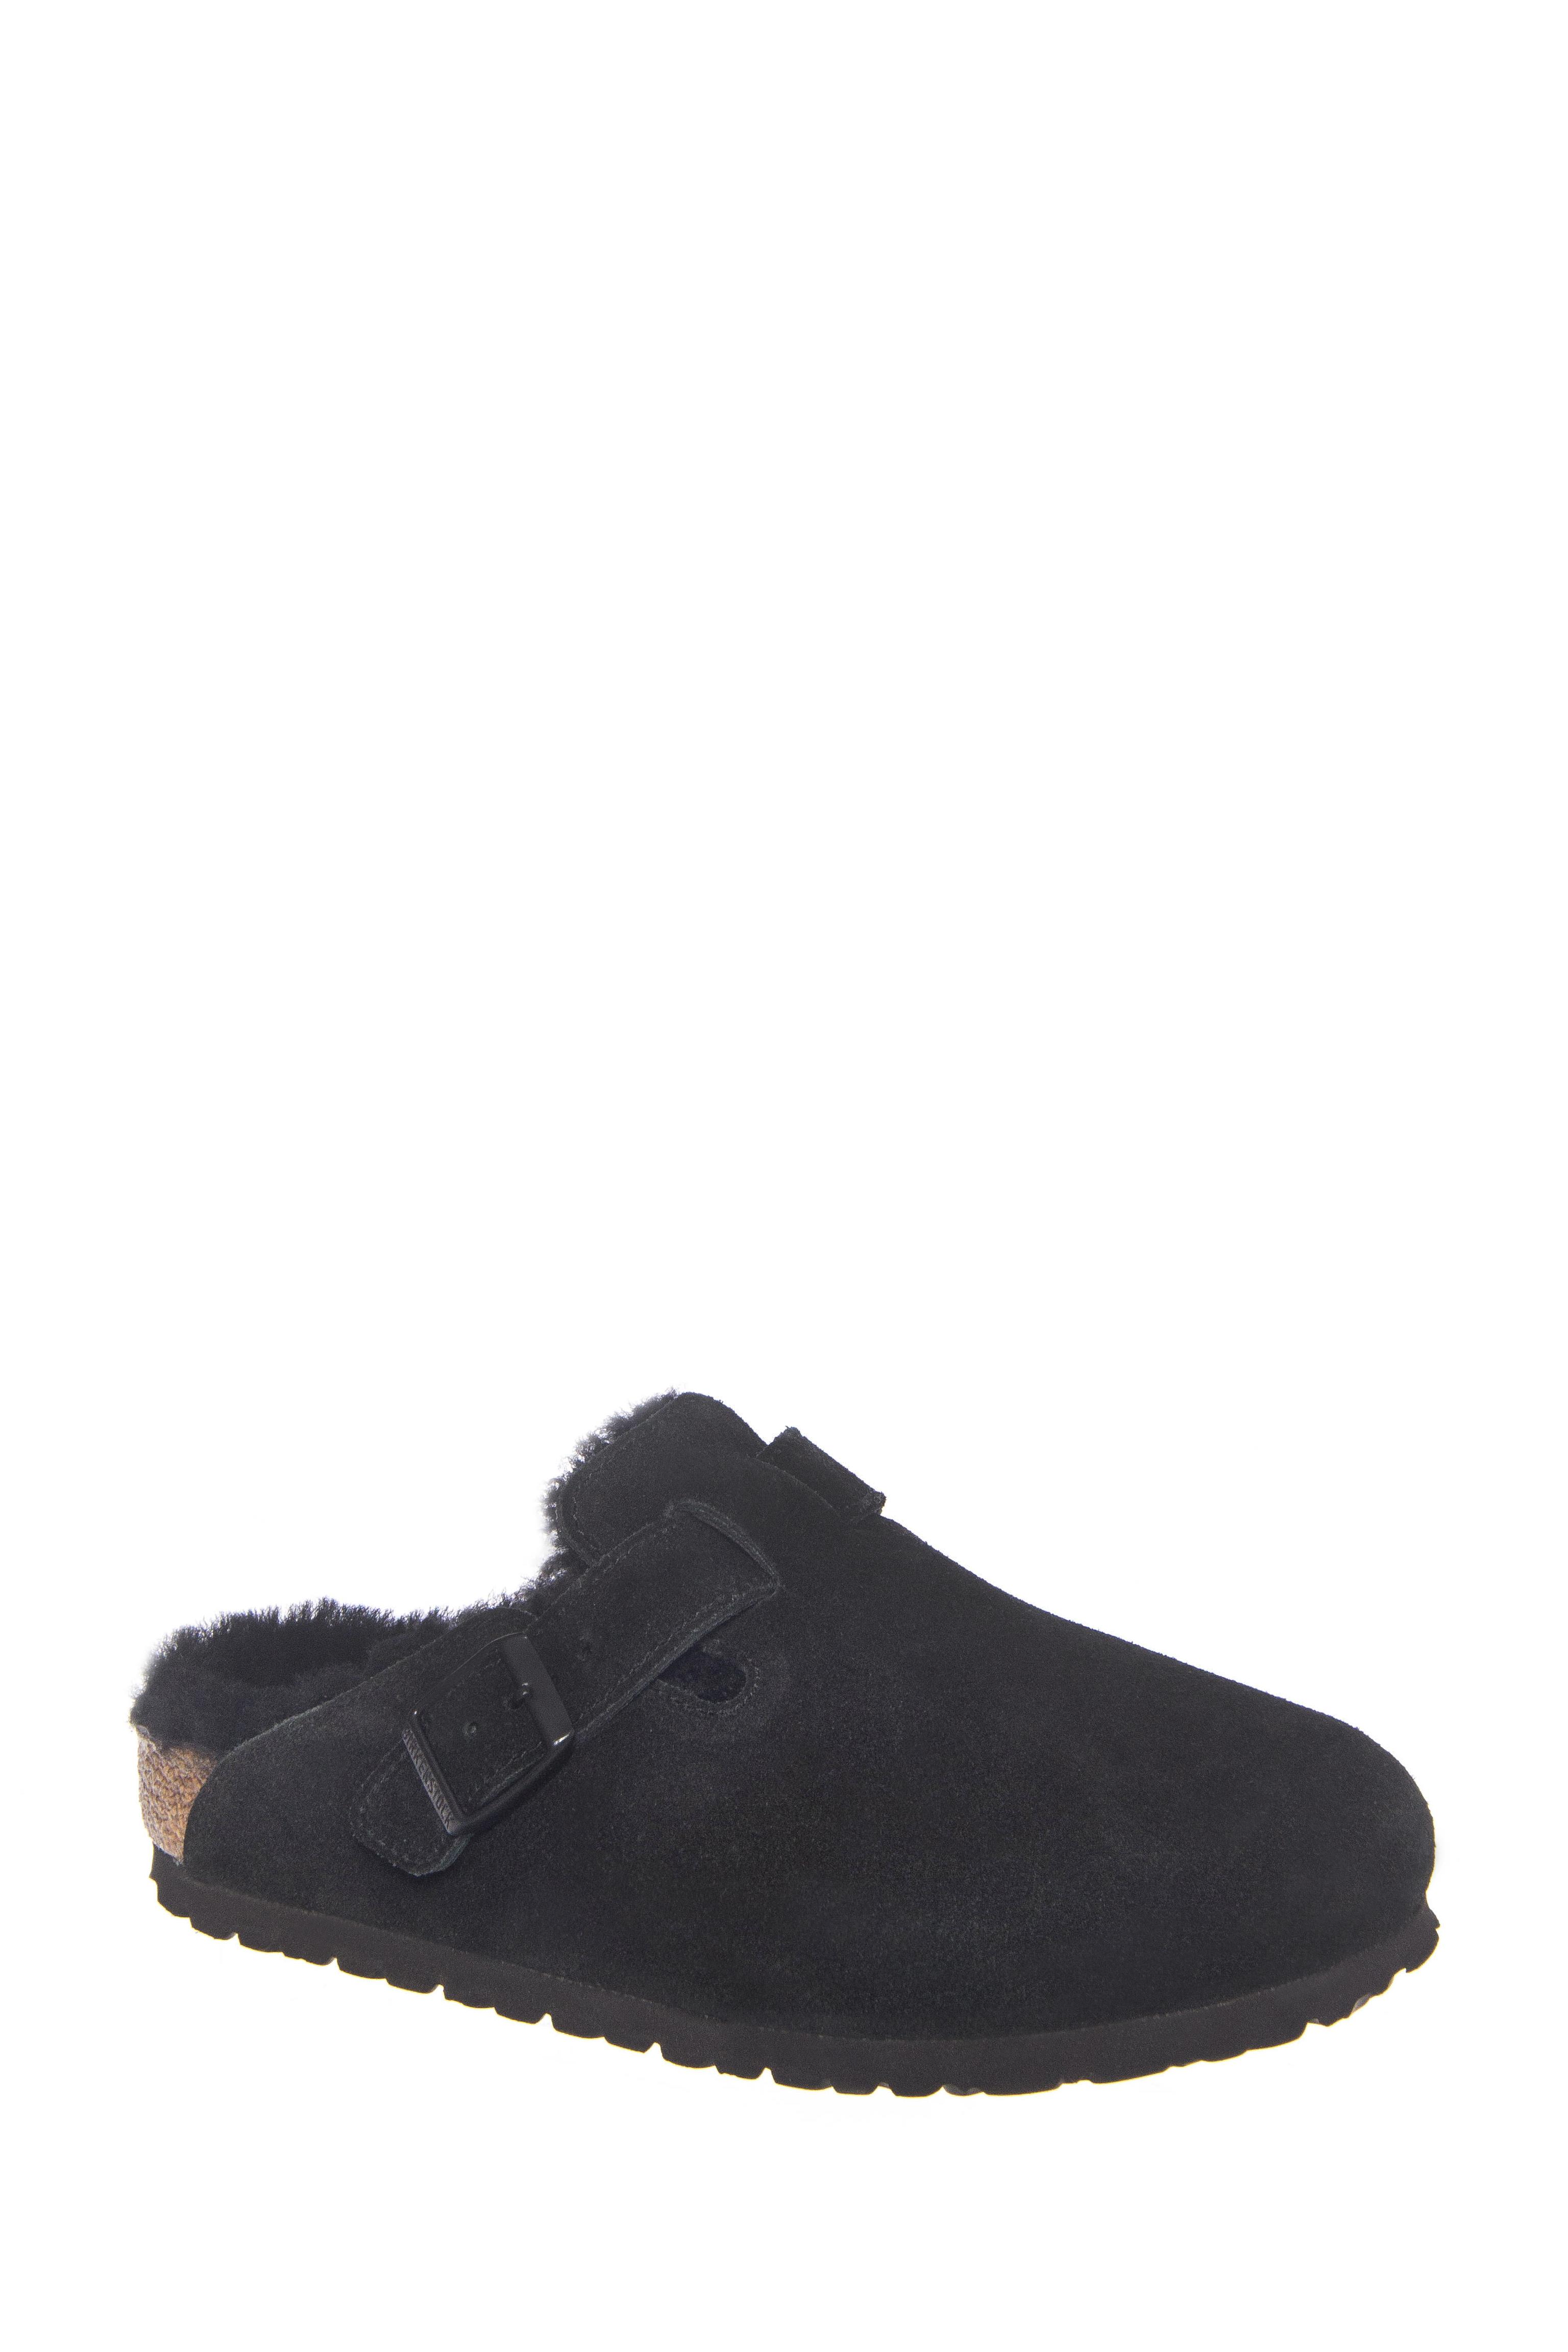 Birkenstock Boston Shearling Fur Flats Slide - Black